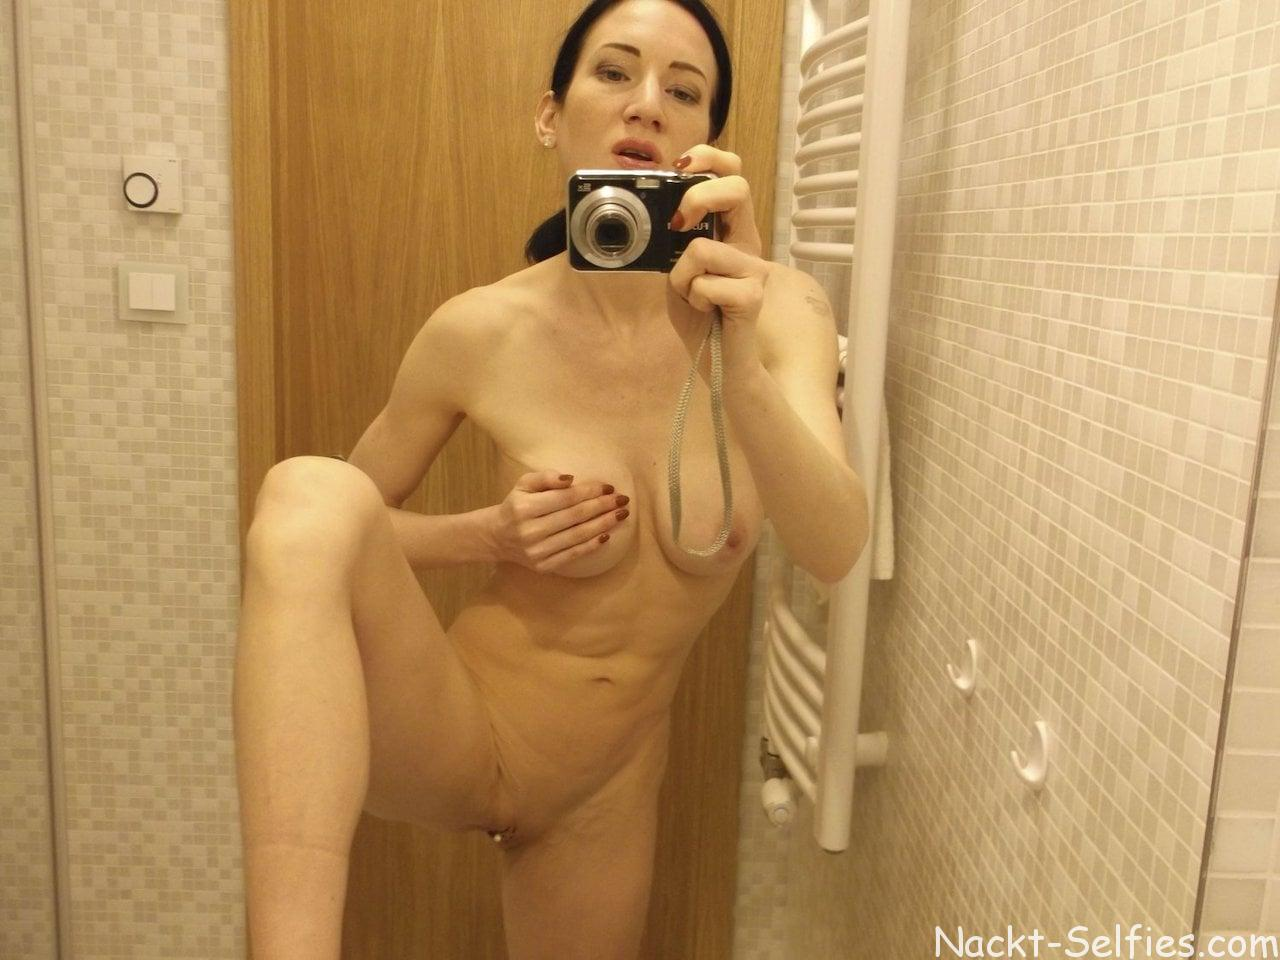 Amateur Nackt Selfie Alissa 05